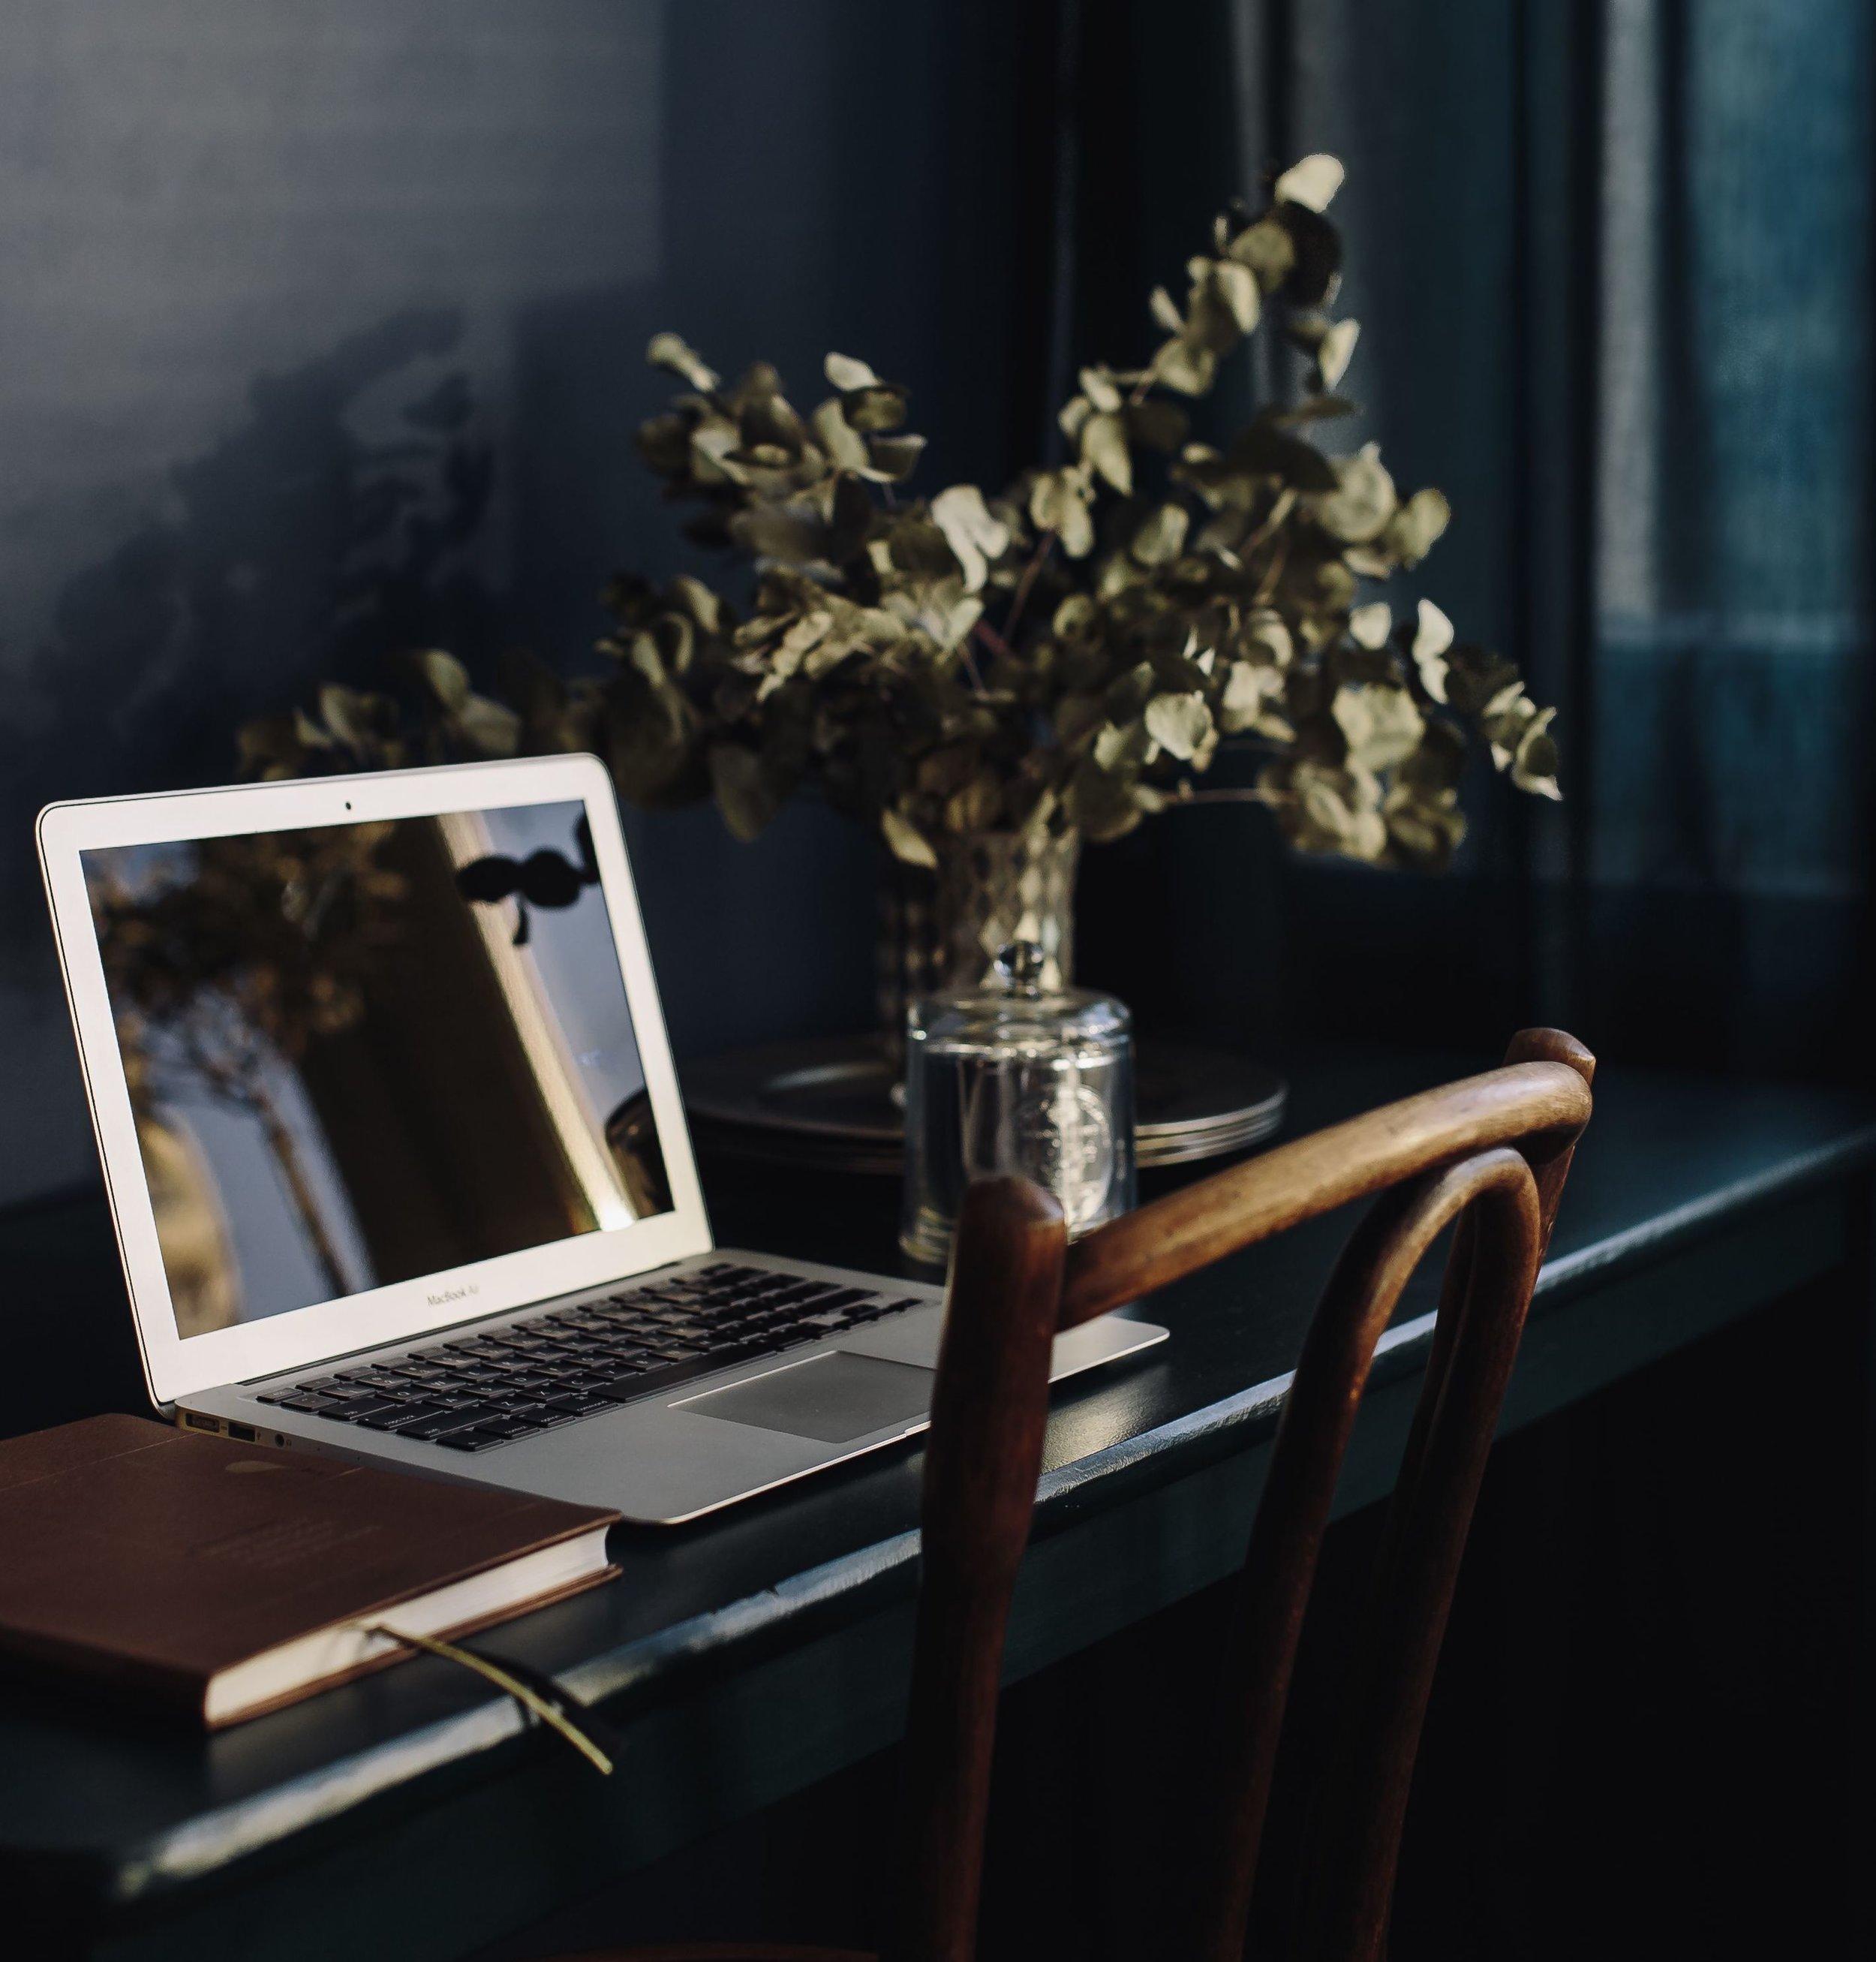 kaboompics_Modern Home Office_cropped.jpg